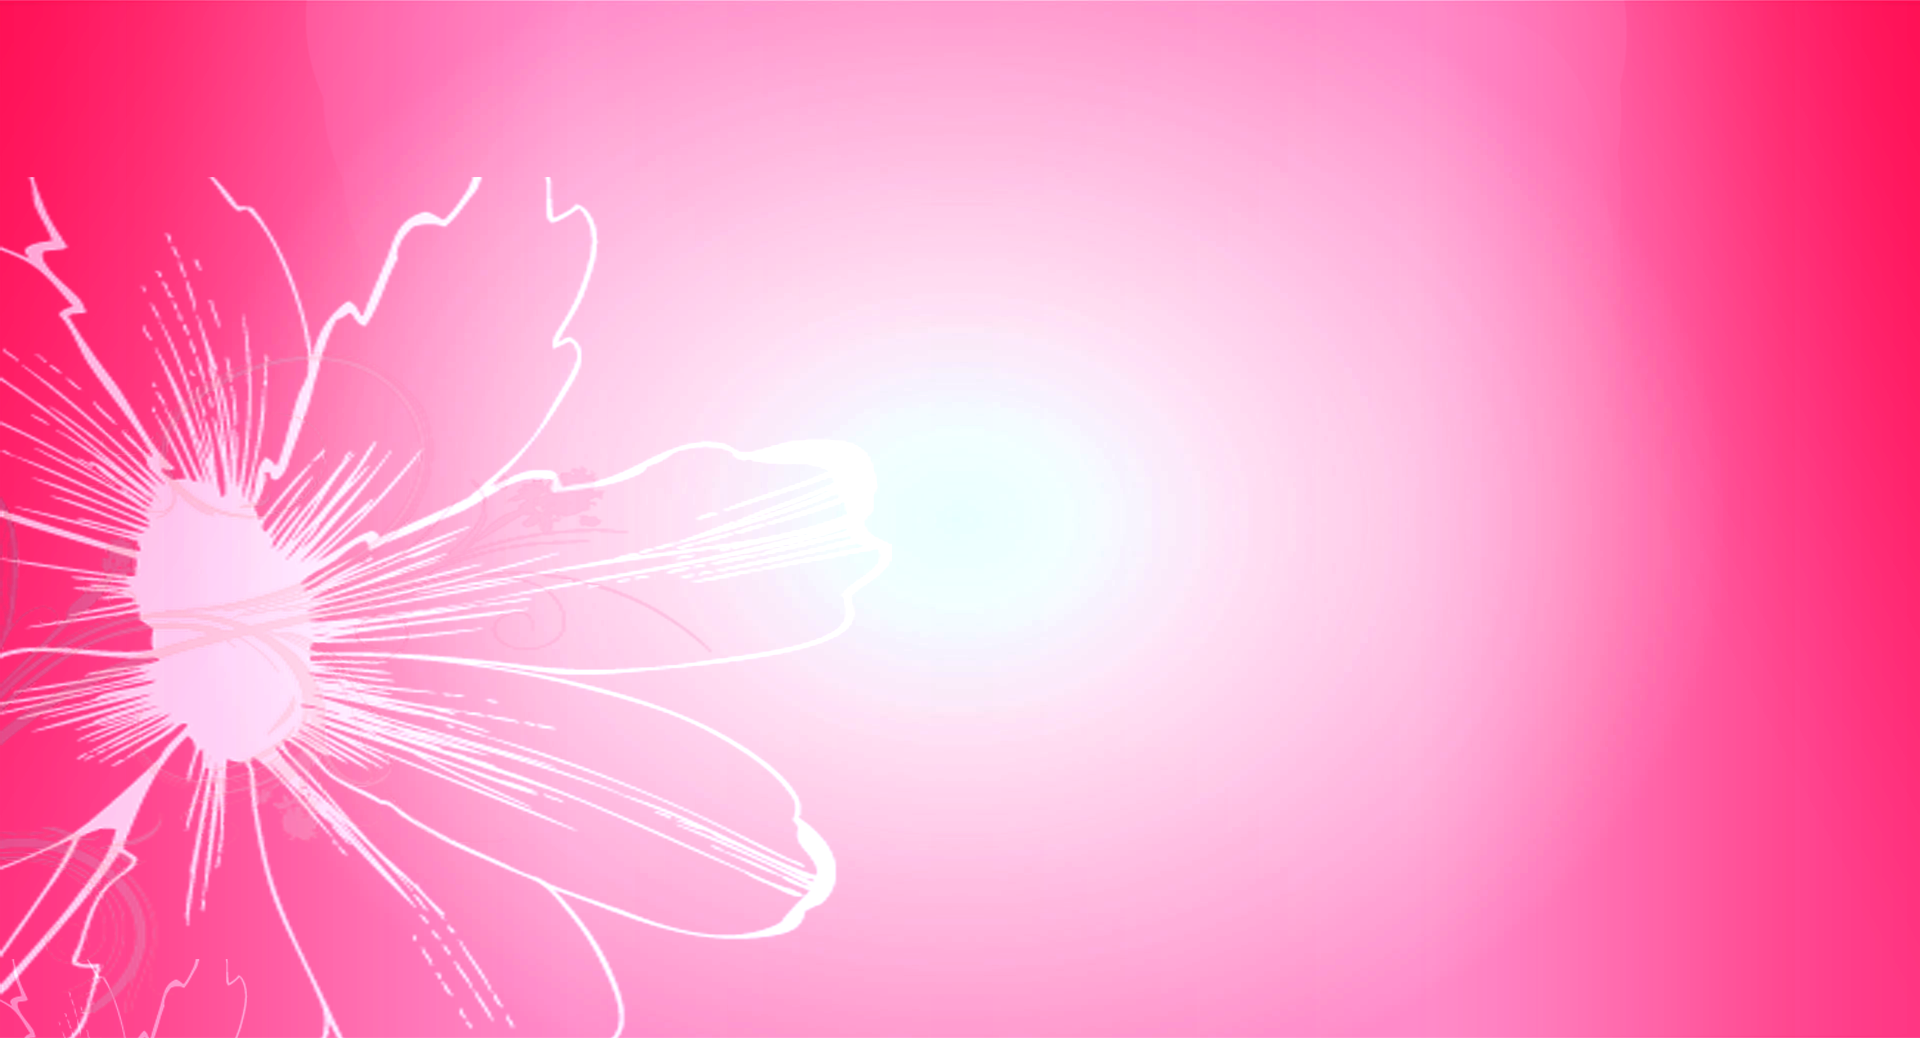 Pink Background Screensaver HD 6770 Wallpaper Cool Walldiskpaper 1920x1038